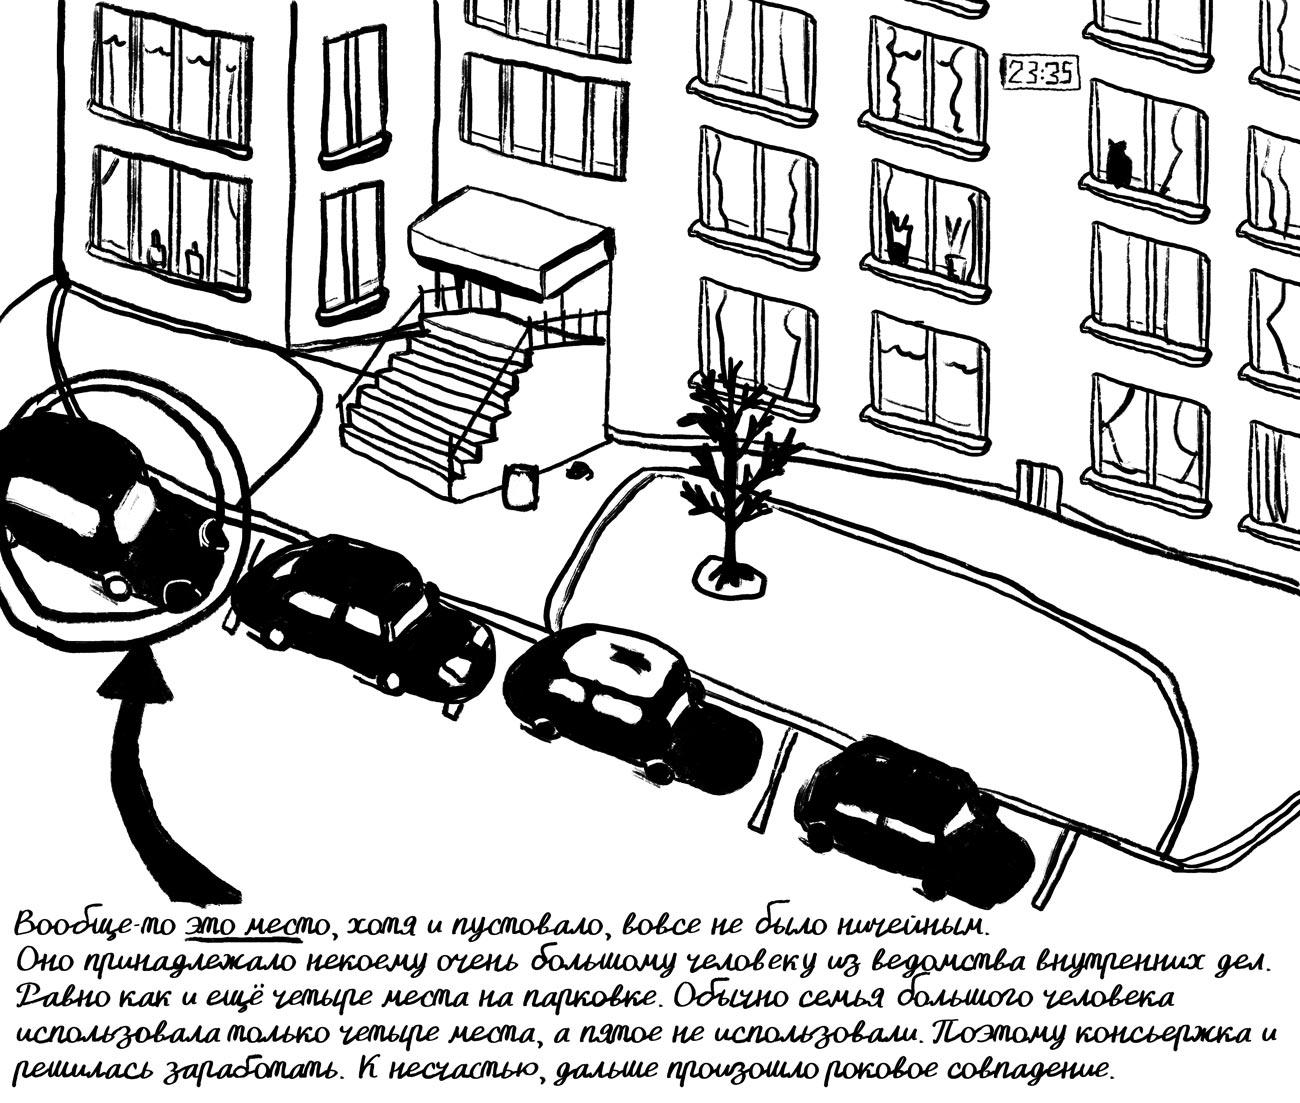 comisc yard 02 - <b>Драма на парковке.</b> Комикс Тани Кремень про кумовство и коррупцию - Заборона